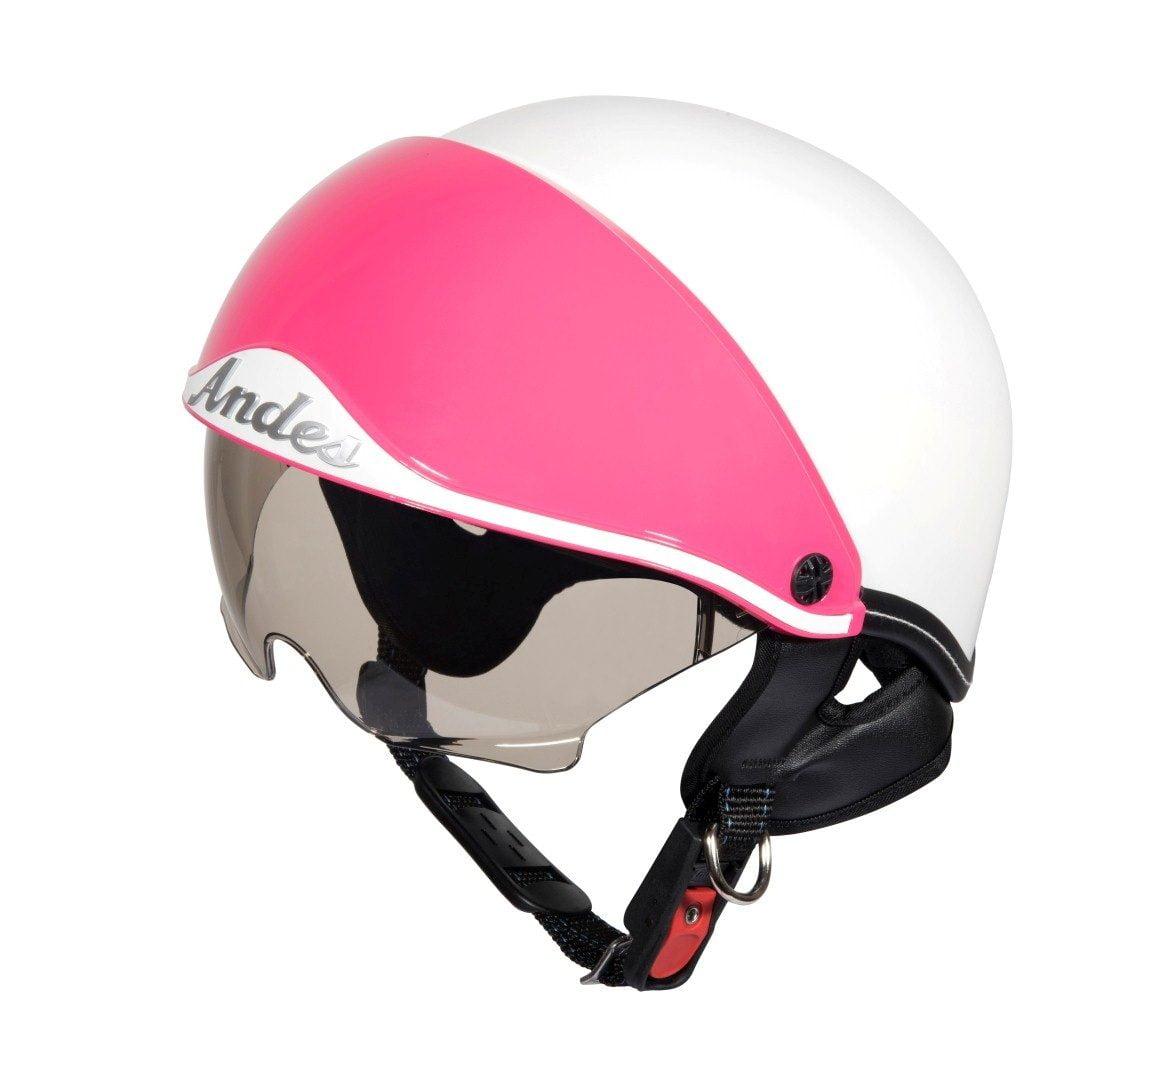 mũ bảo hiểm andes 139 trắng hồng